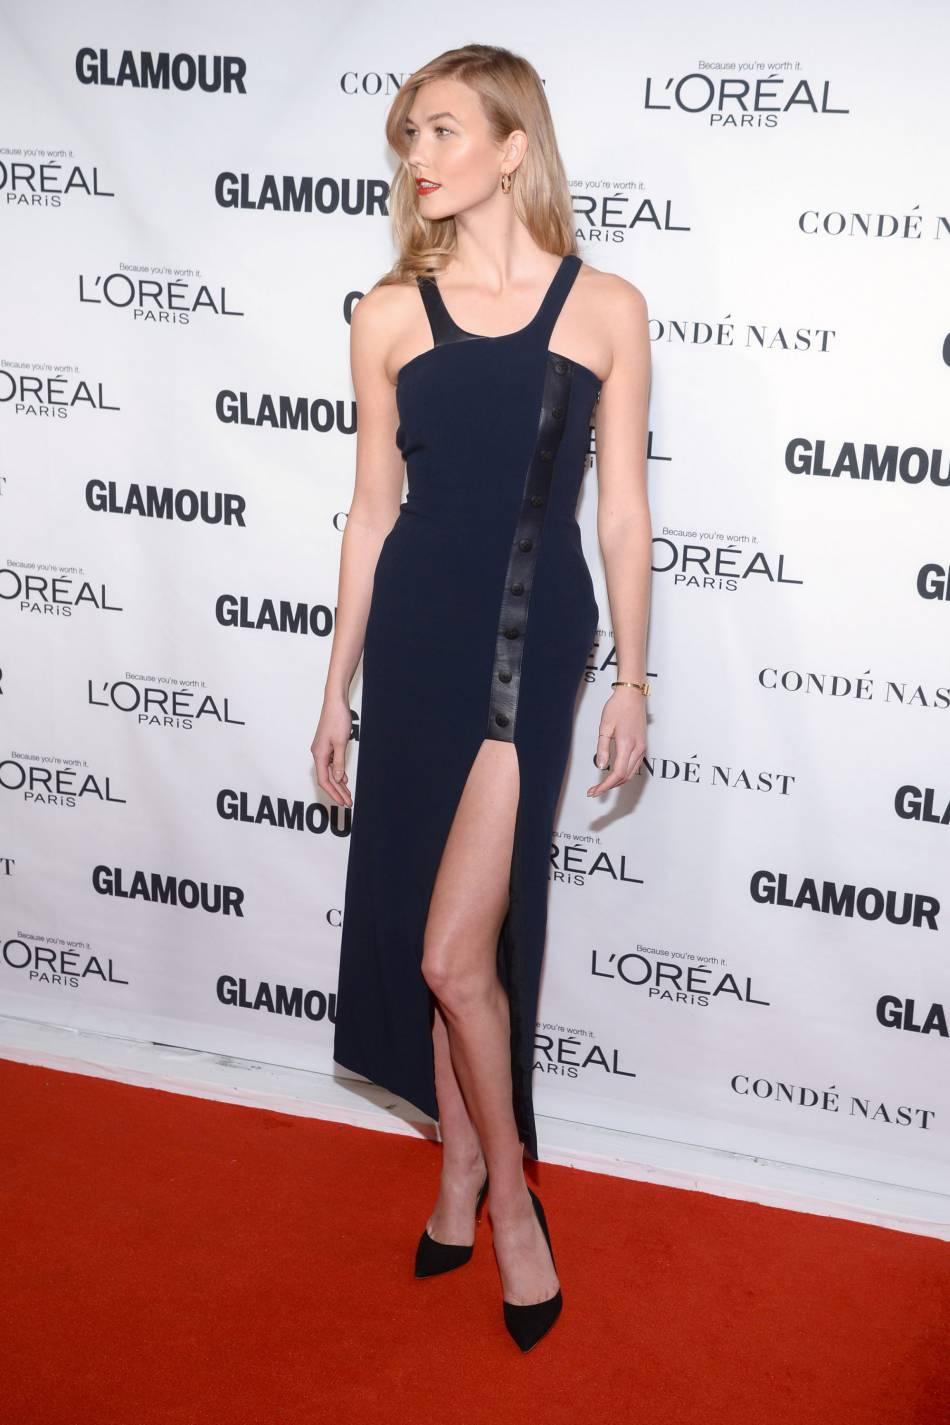 Karlie Kloss aux Glamour Awards le 9 novembre 2015 à New York.